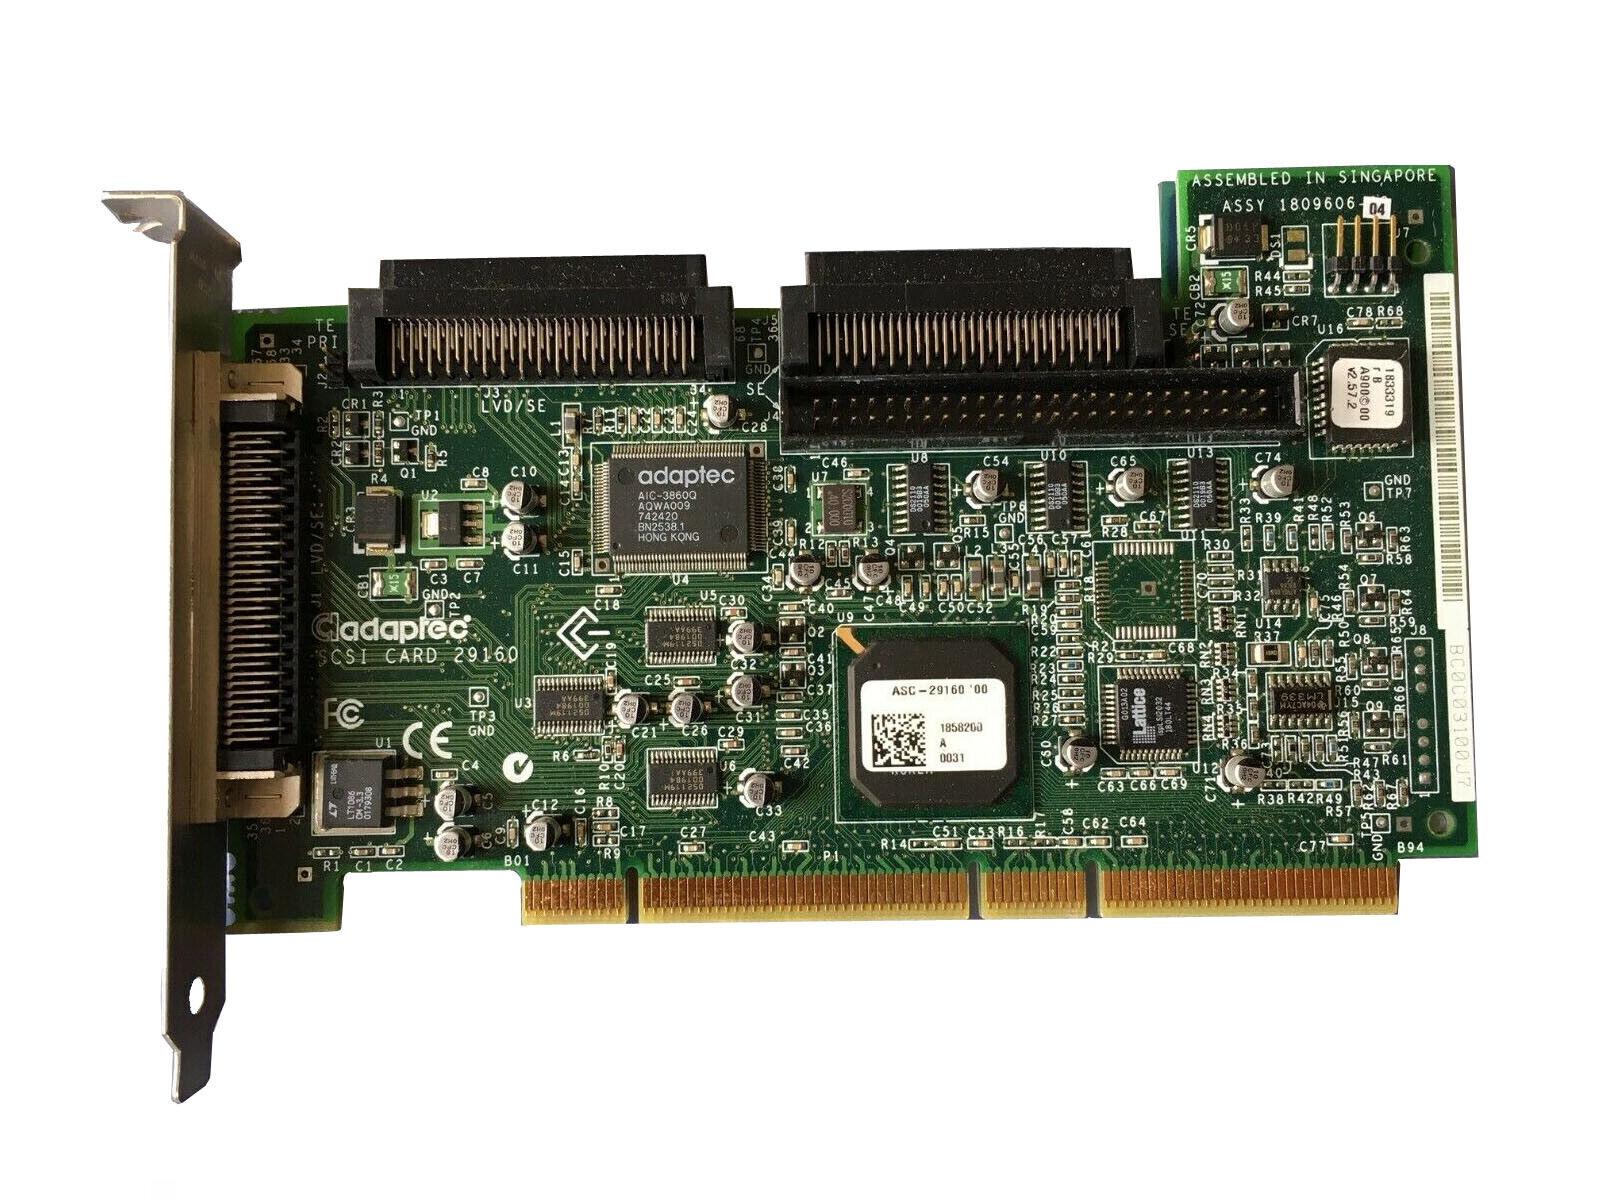 Adaptec SCSI card 29160 SCSI Card Controller ** 13